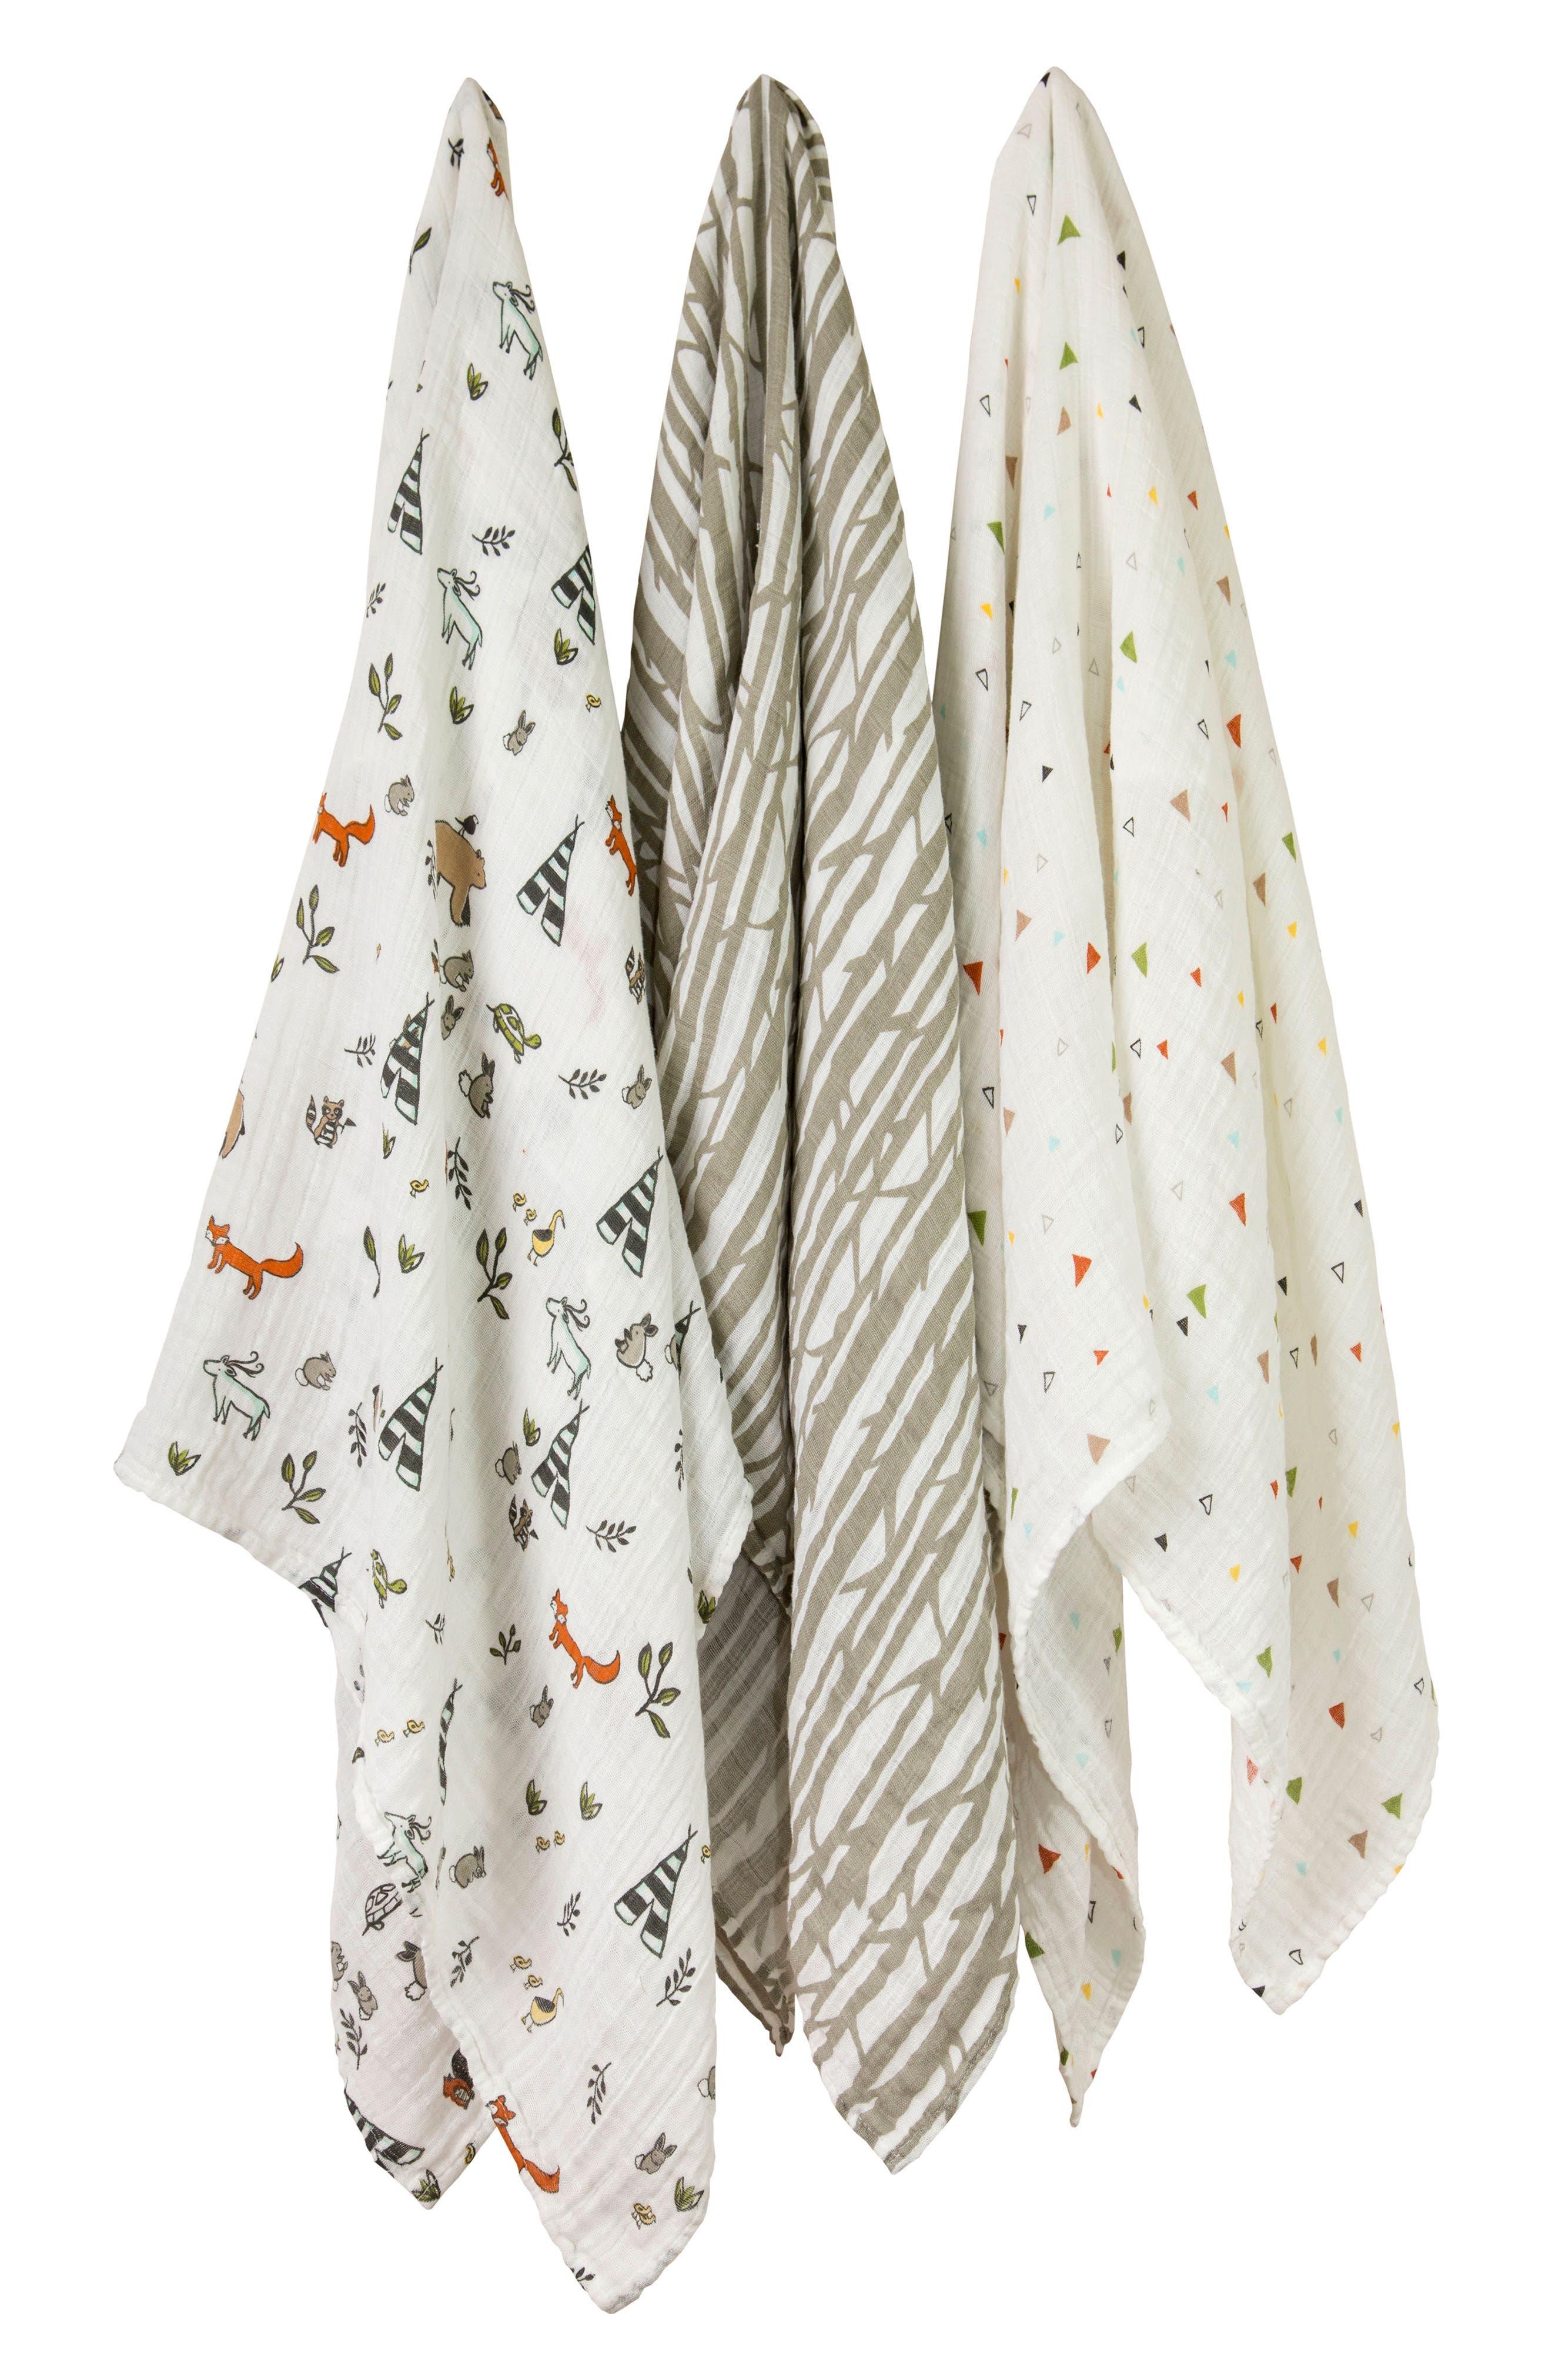 LITTLE UNICORN,                             3-Pack Cotton Muslin Blankets,                             Main thumbnail 1, color,                             FOREST FRIENDS